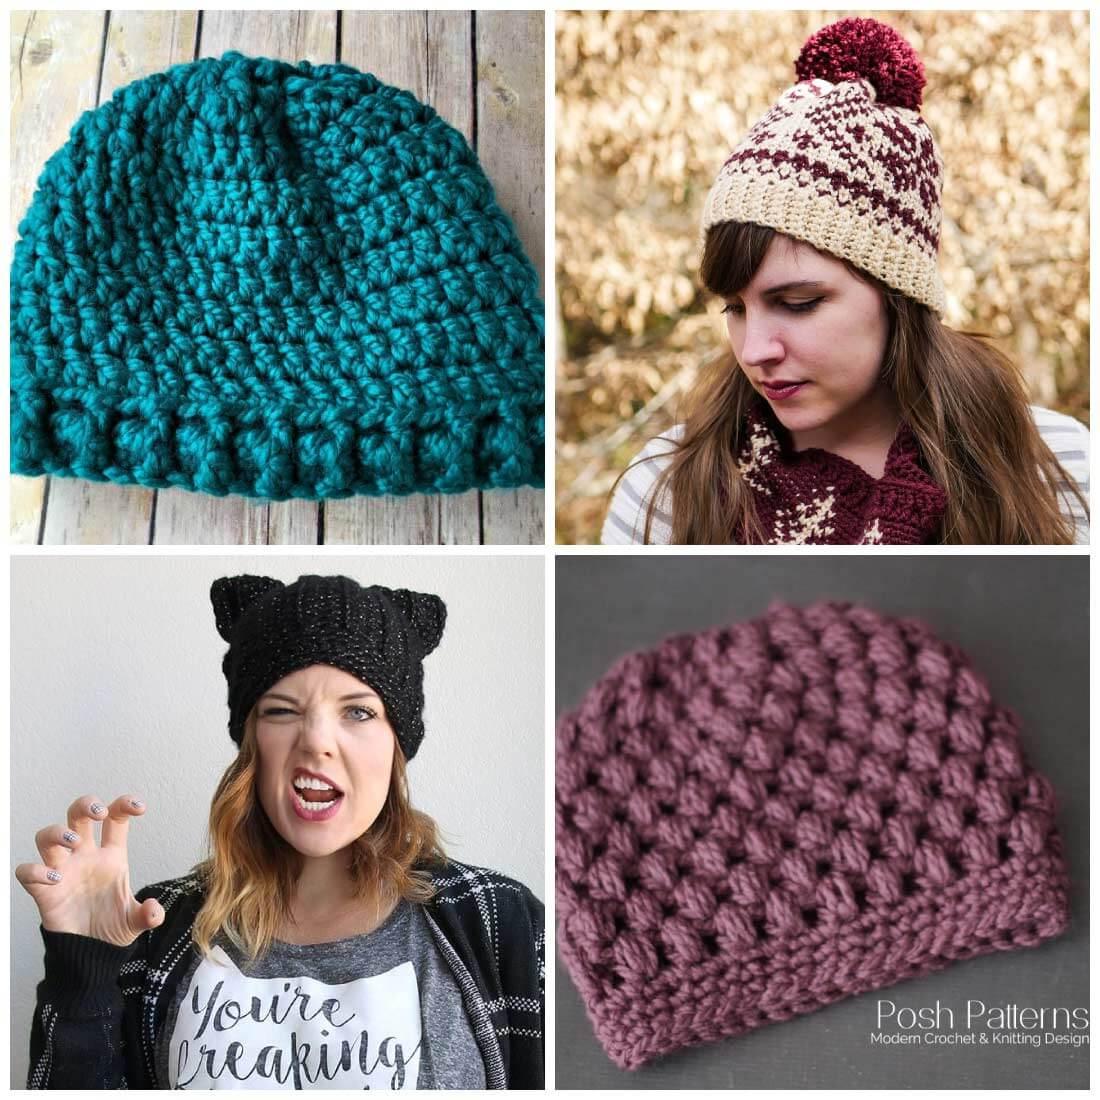 free crochet hat patterns | free crochet patterns | crochet patterns | use oudghsg